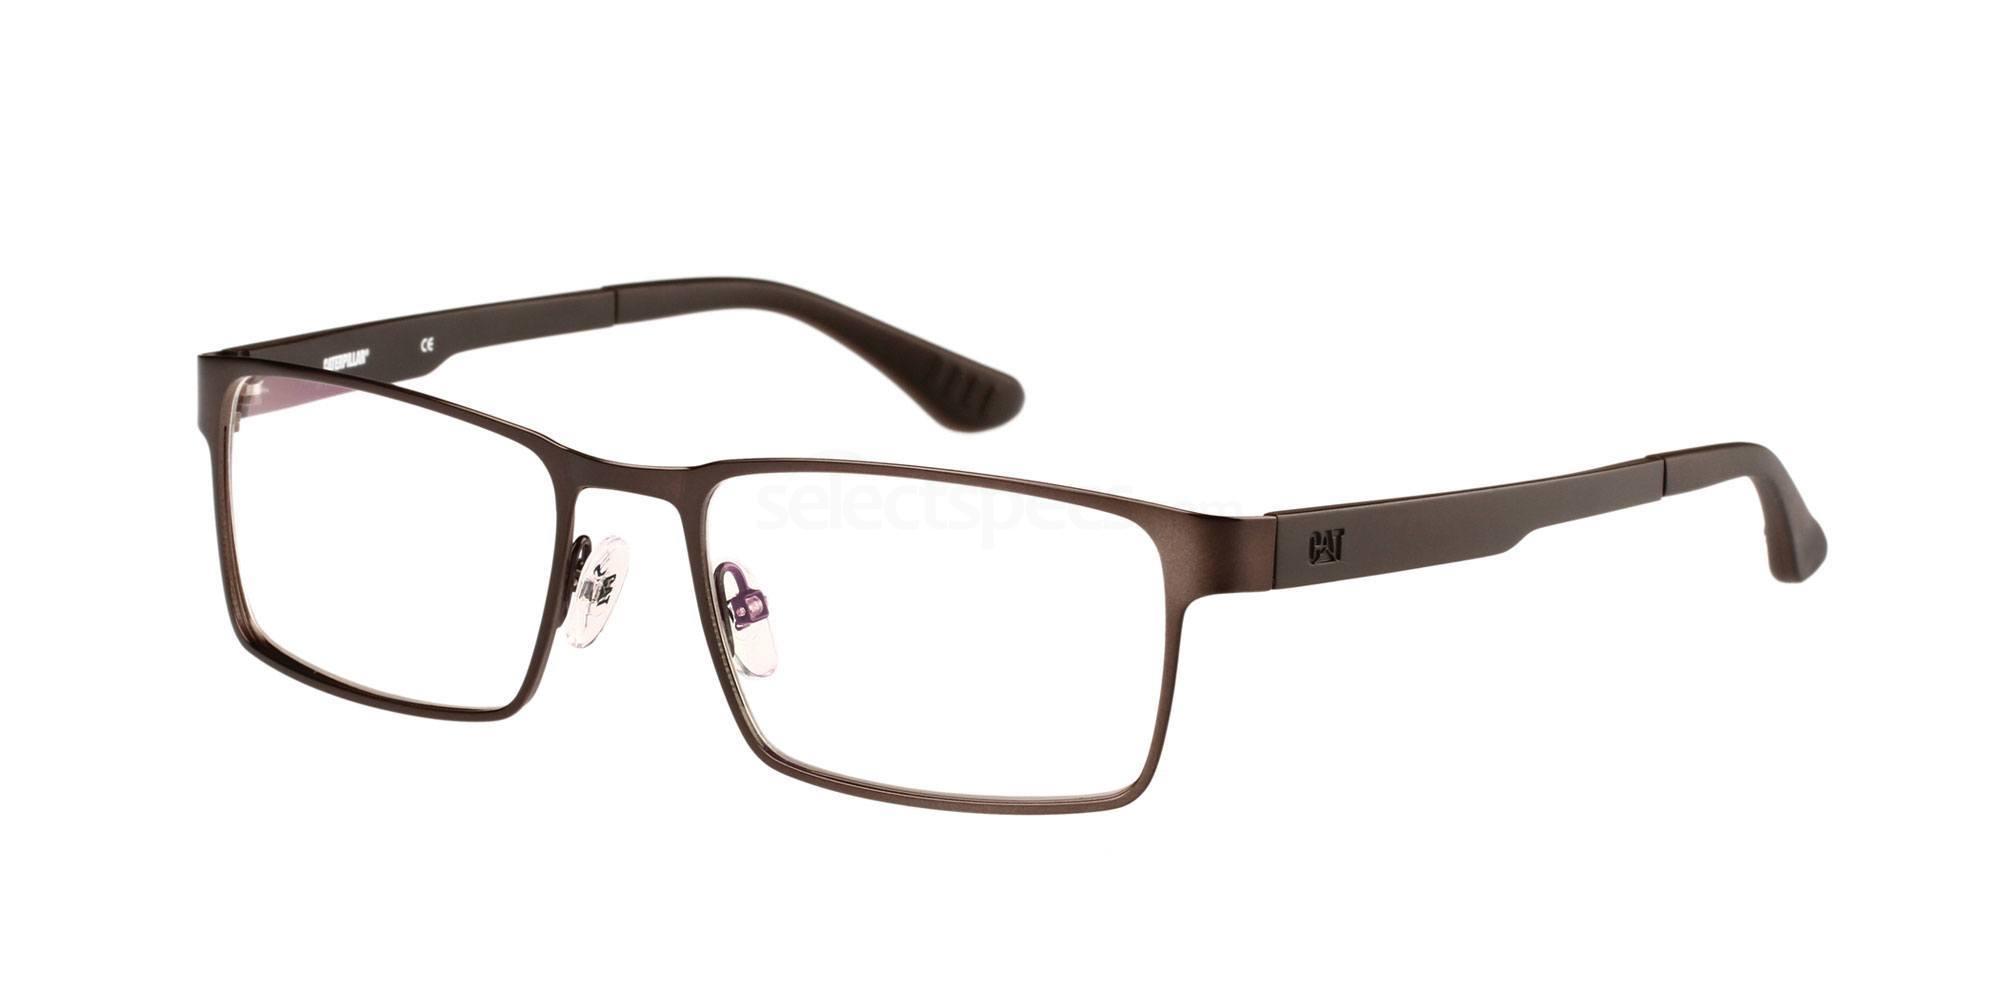 205 CTO J06 Glasses, CAT